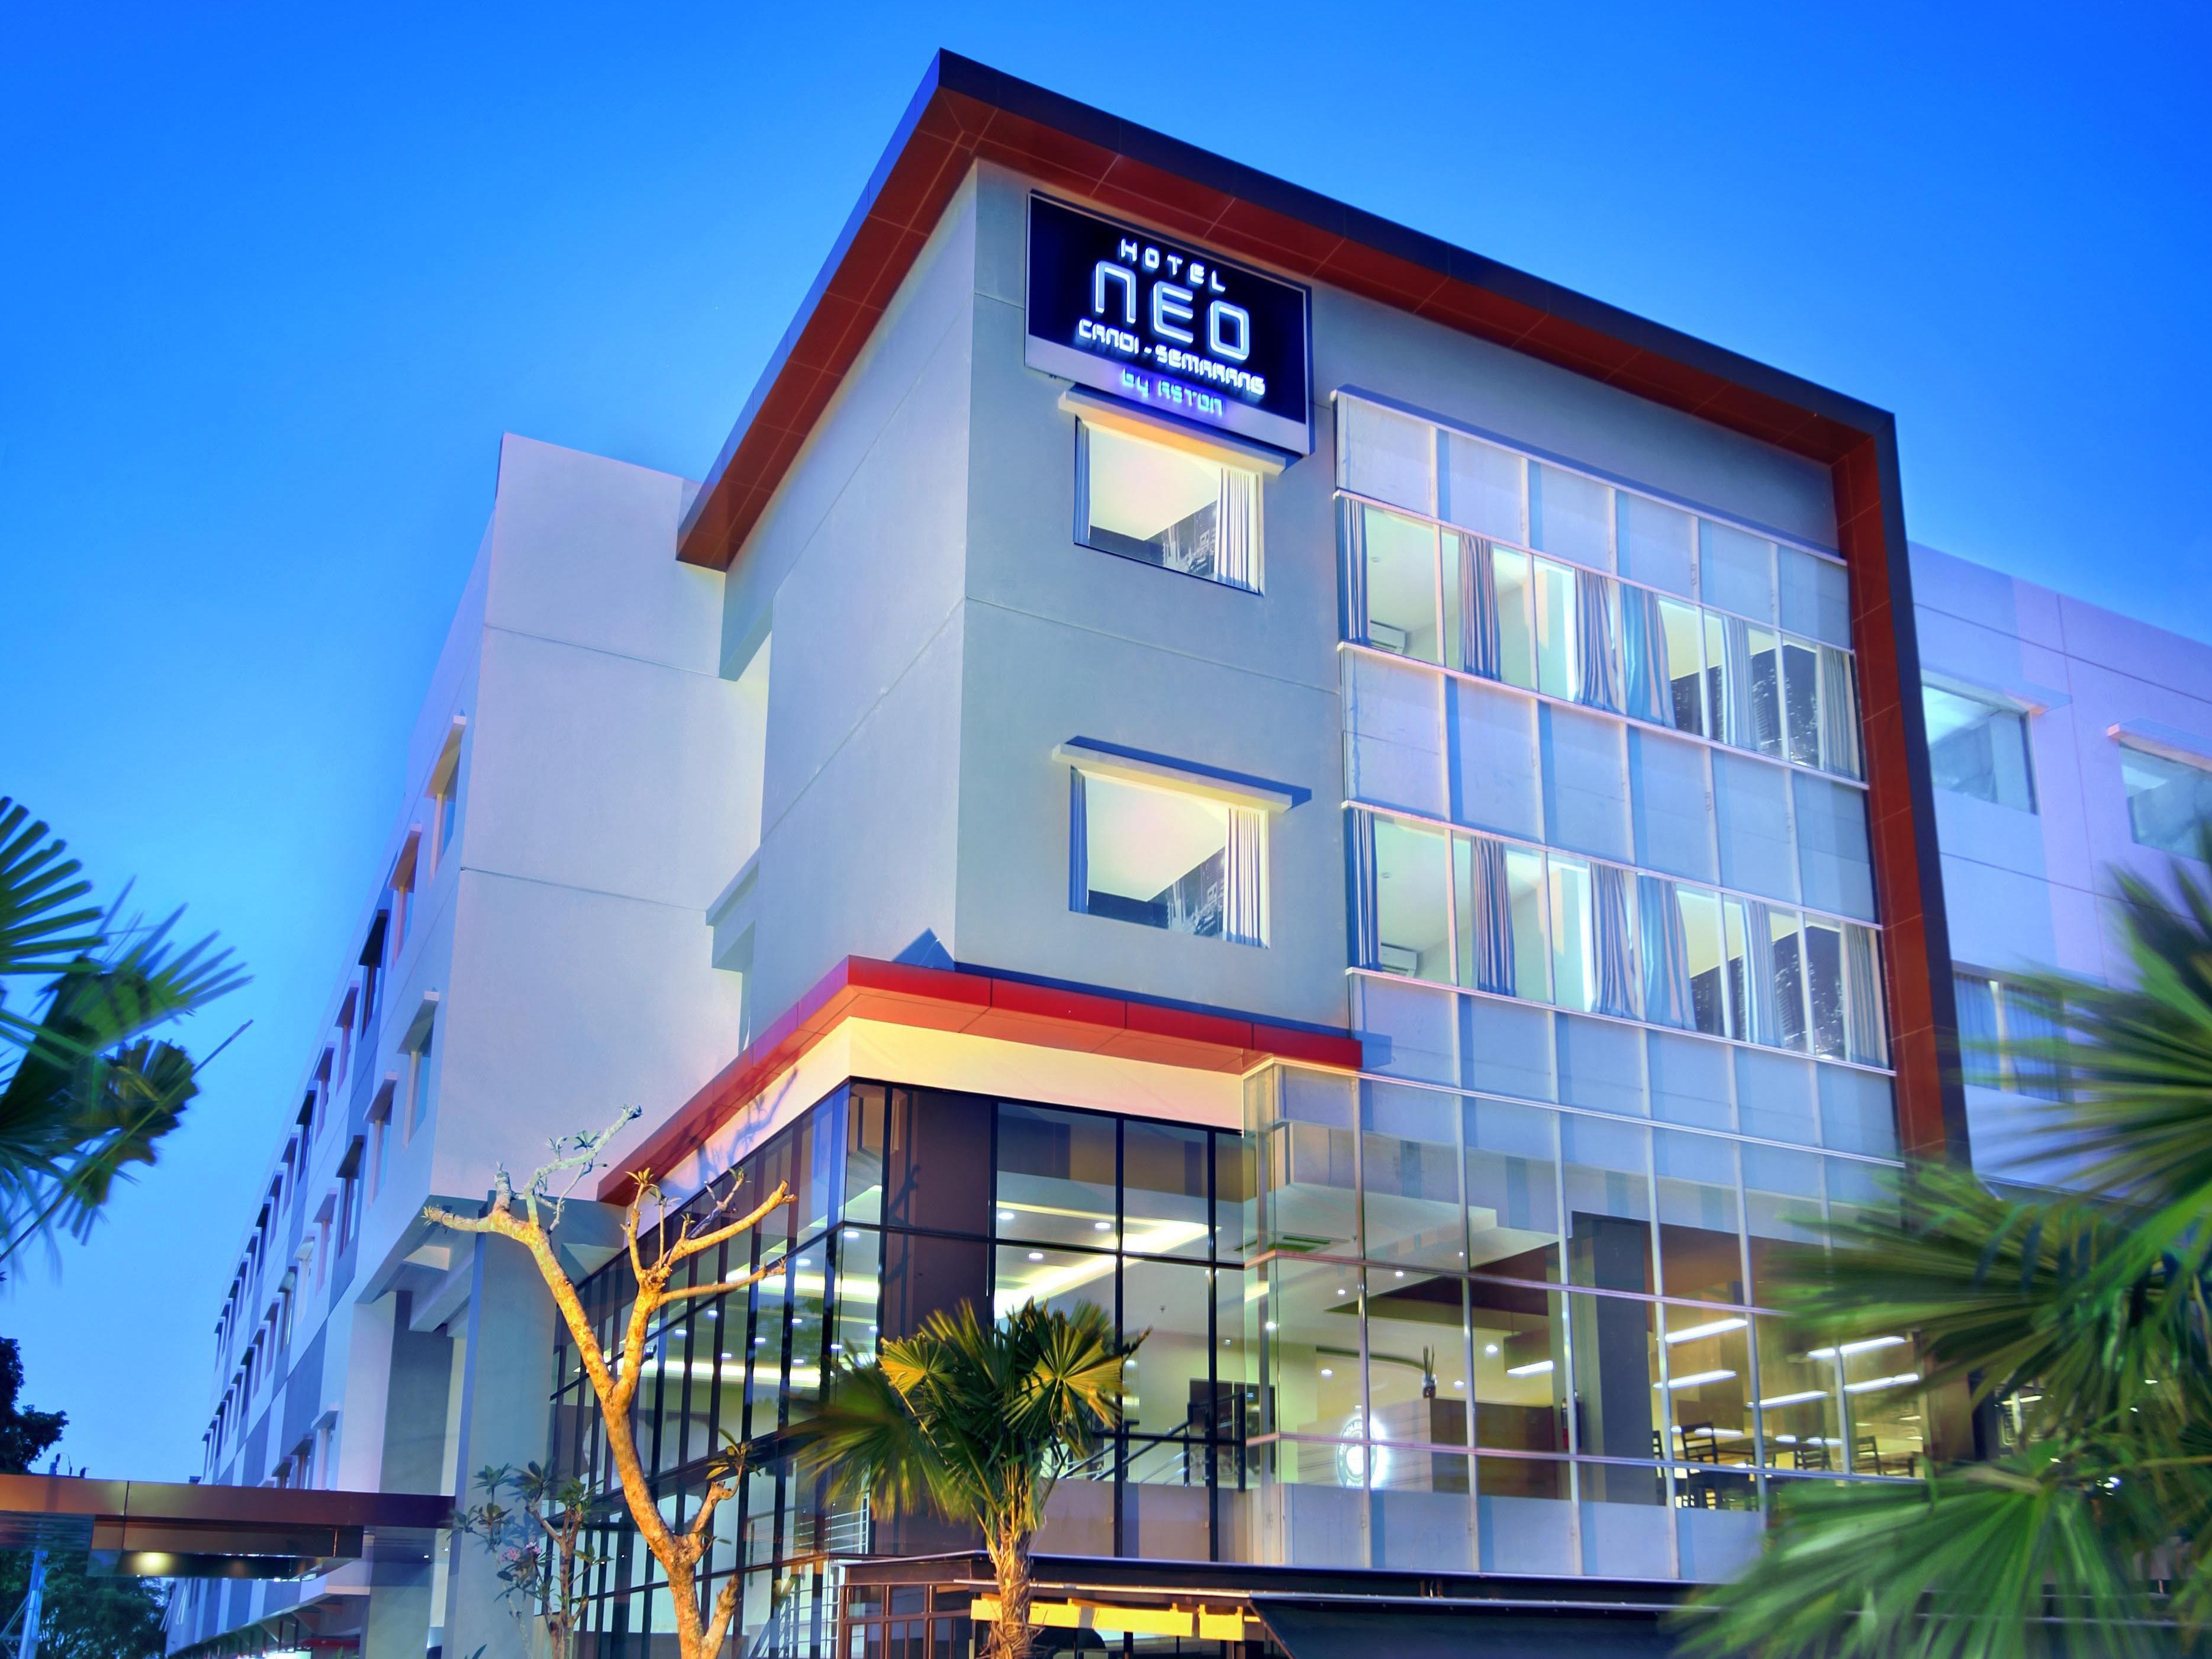 Semarang Hotel Neo Candi Semarang Indonesia Asia Hotel Neo Candi